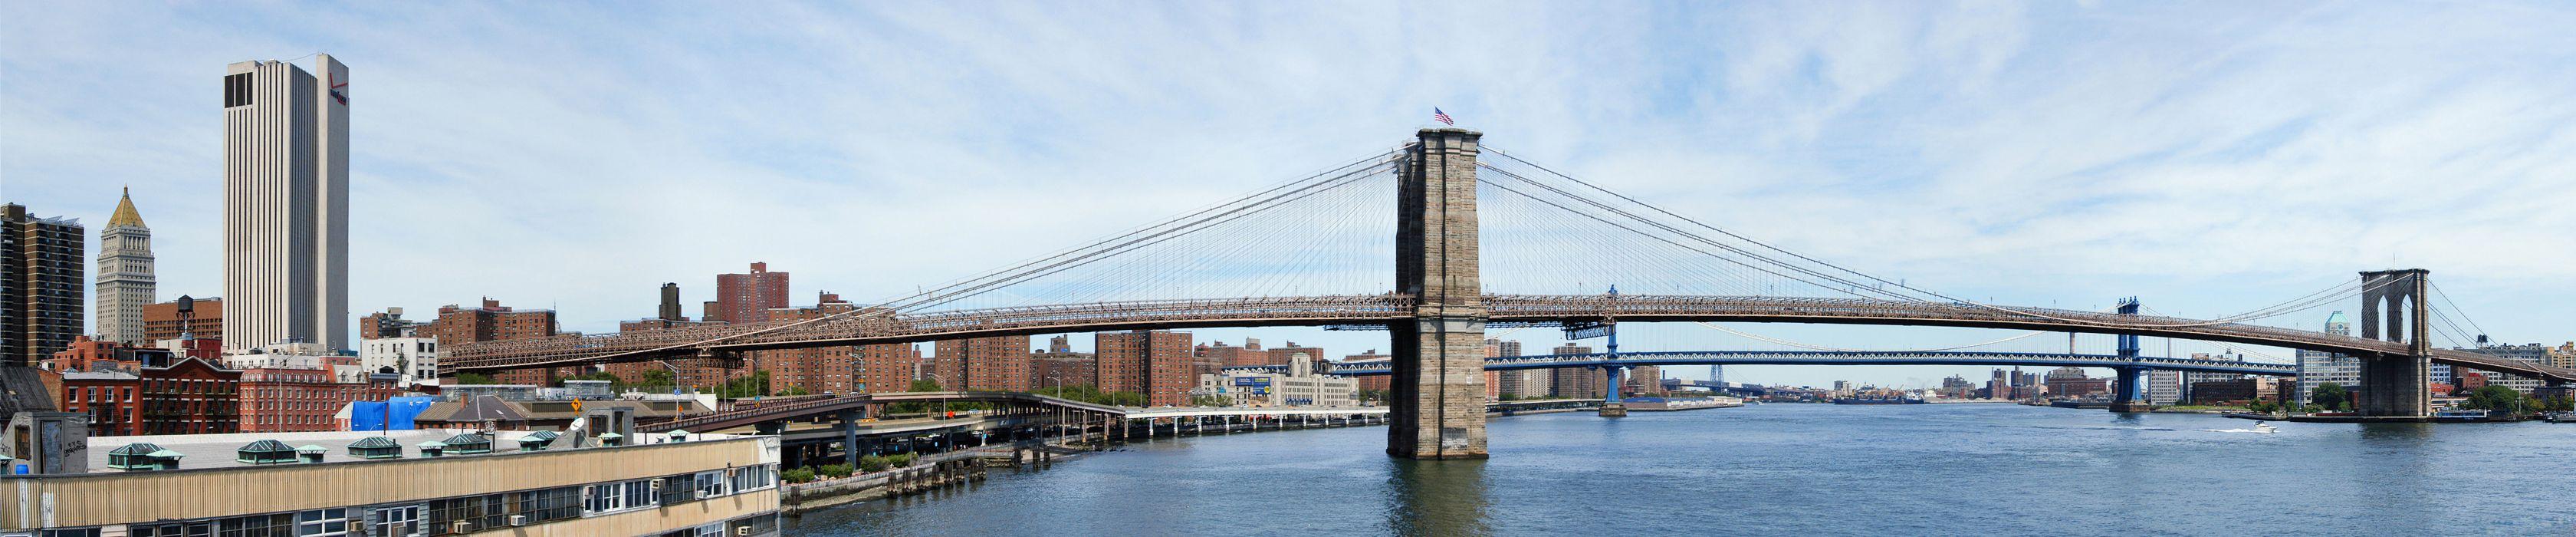 New York Brooklyn Bridge    g wallpaper